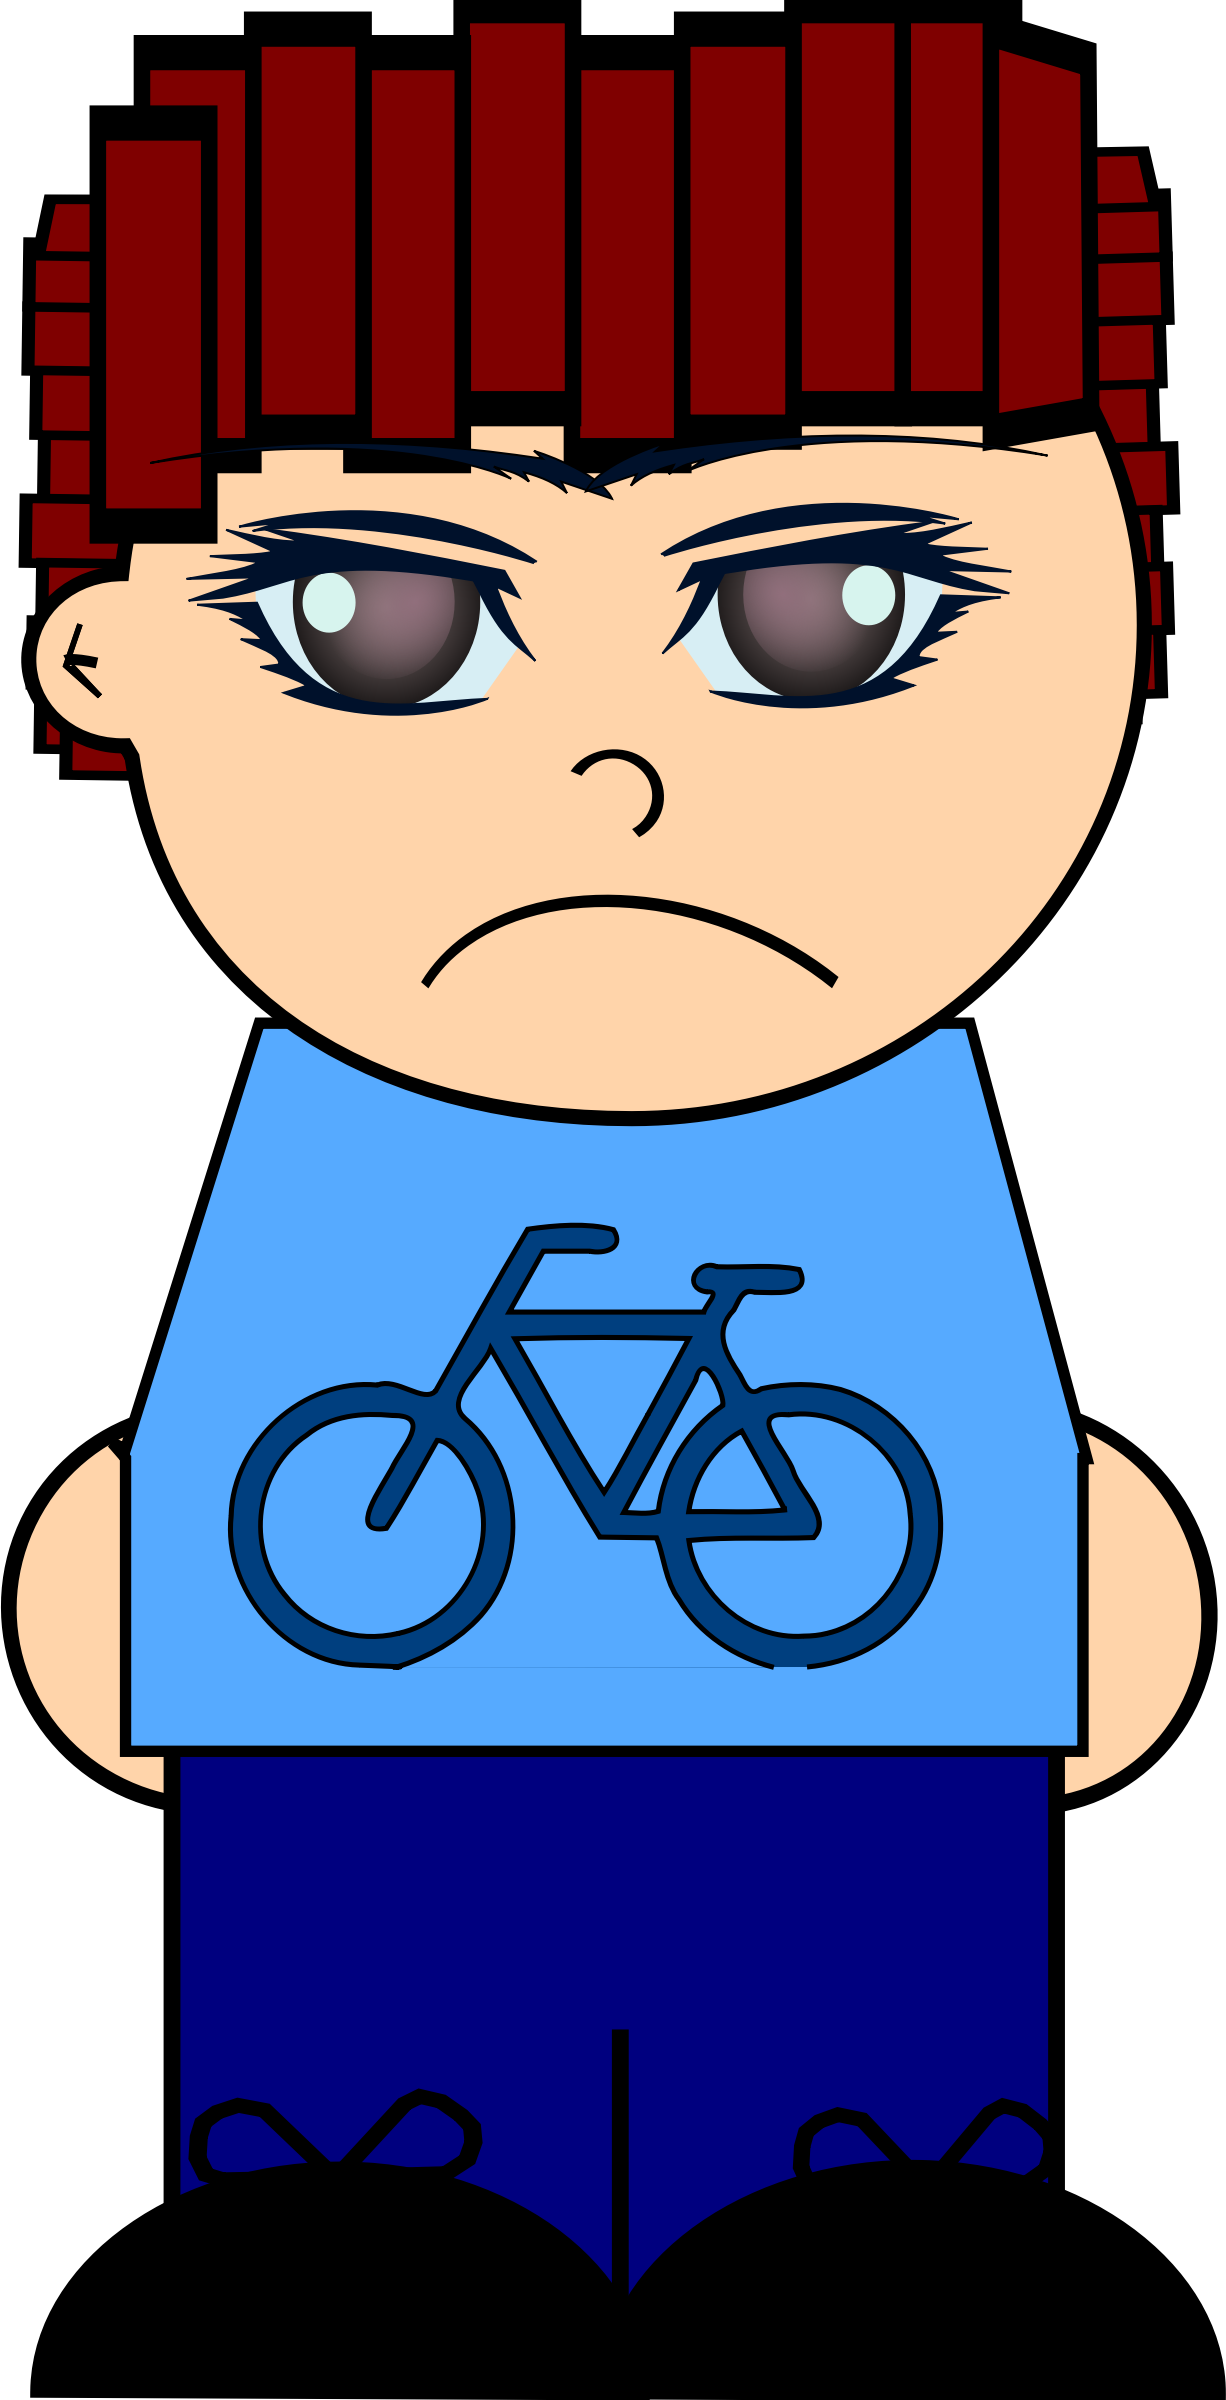 Movement clipart sadboy. Sad boy group cartoon